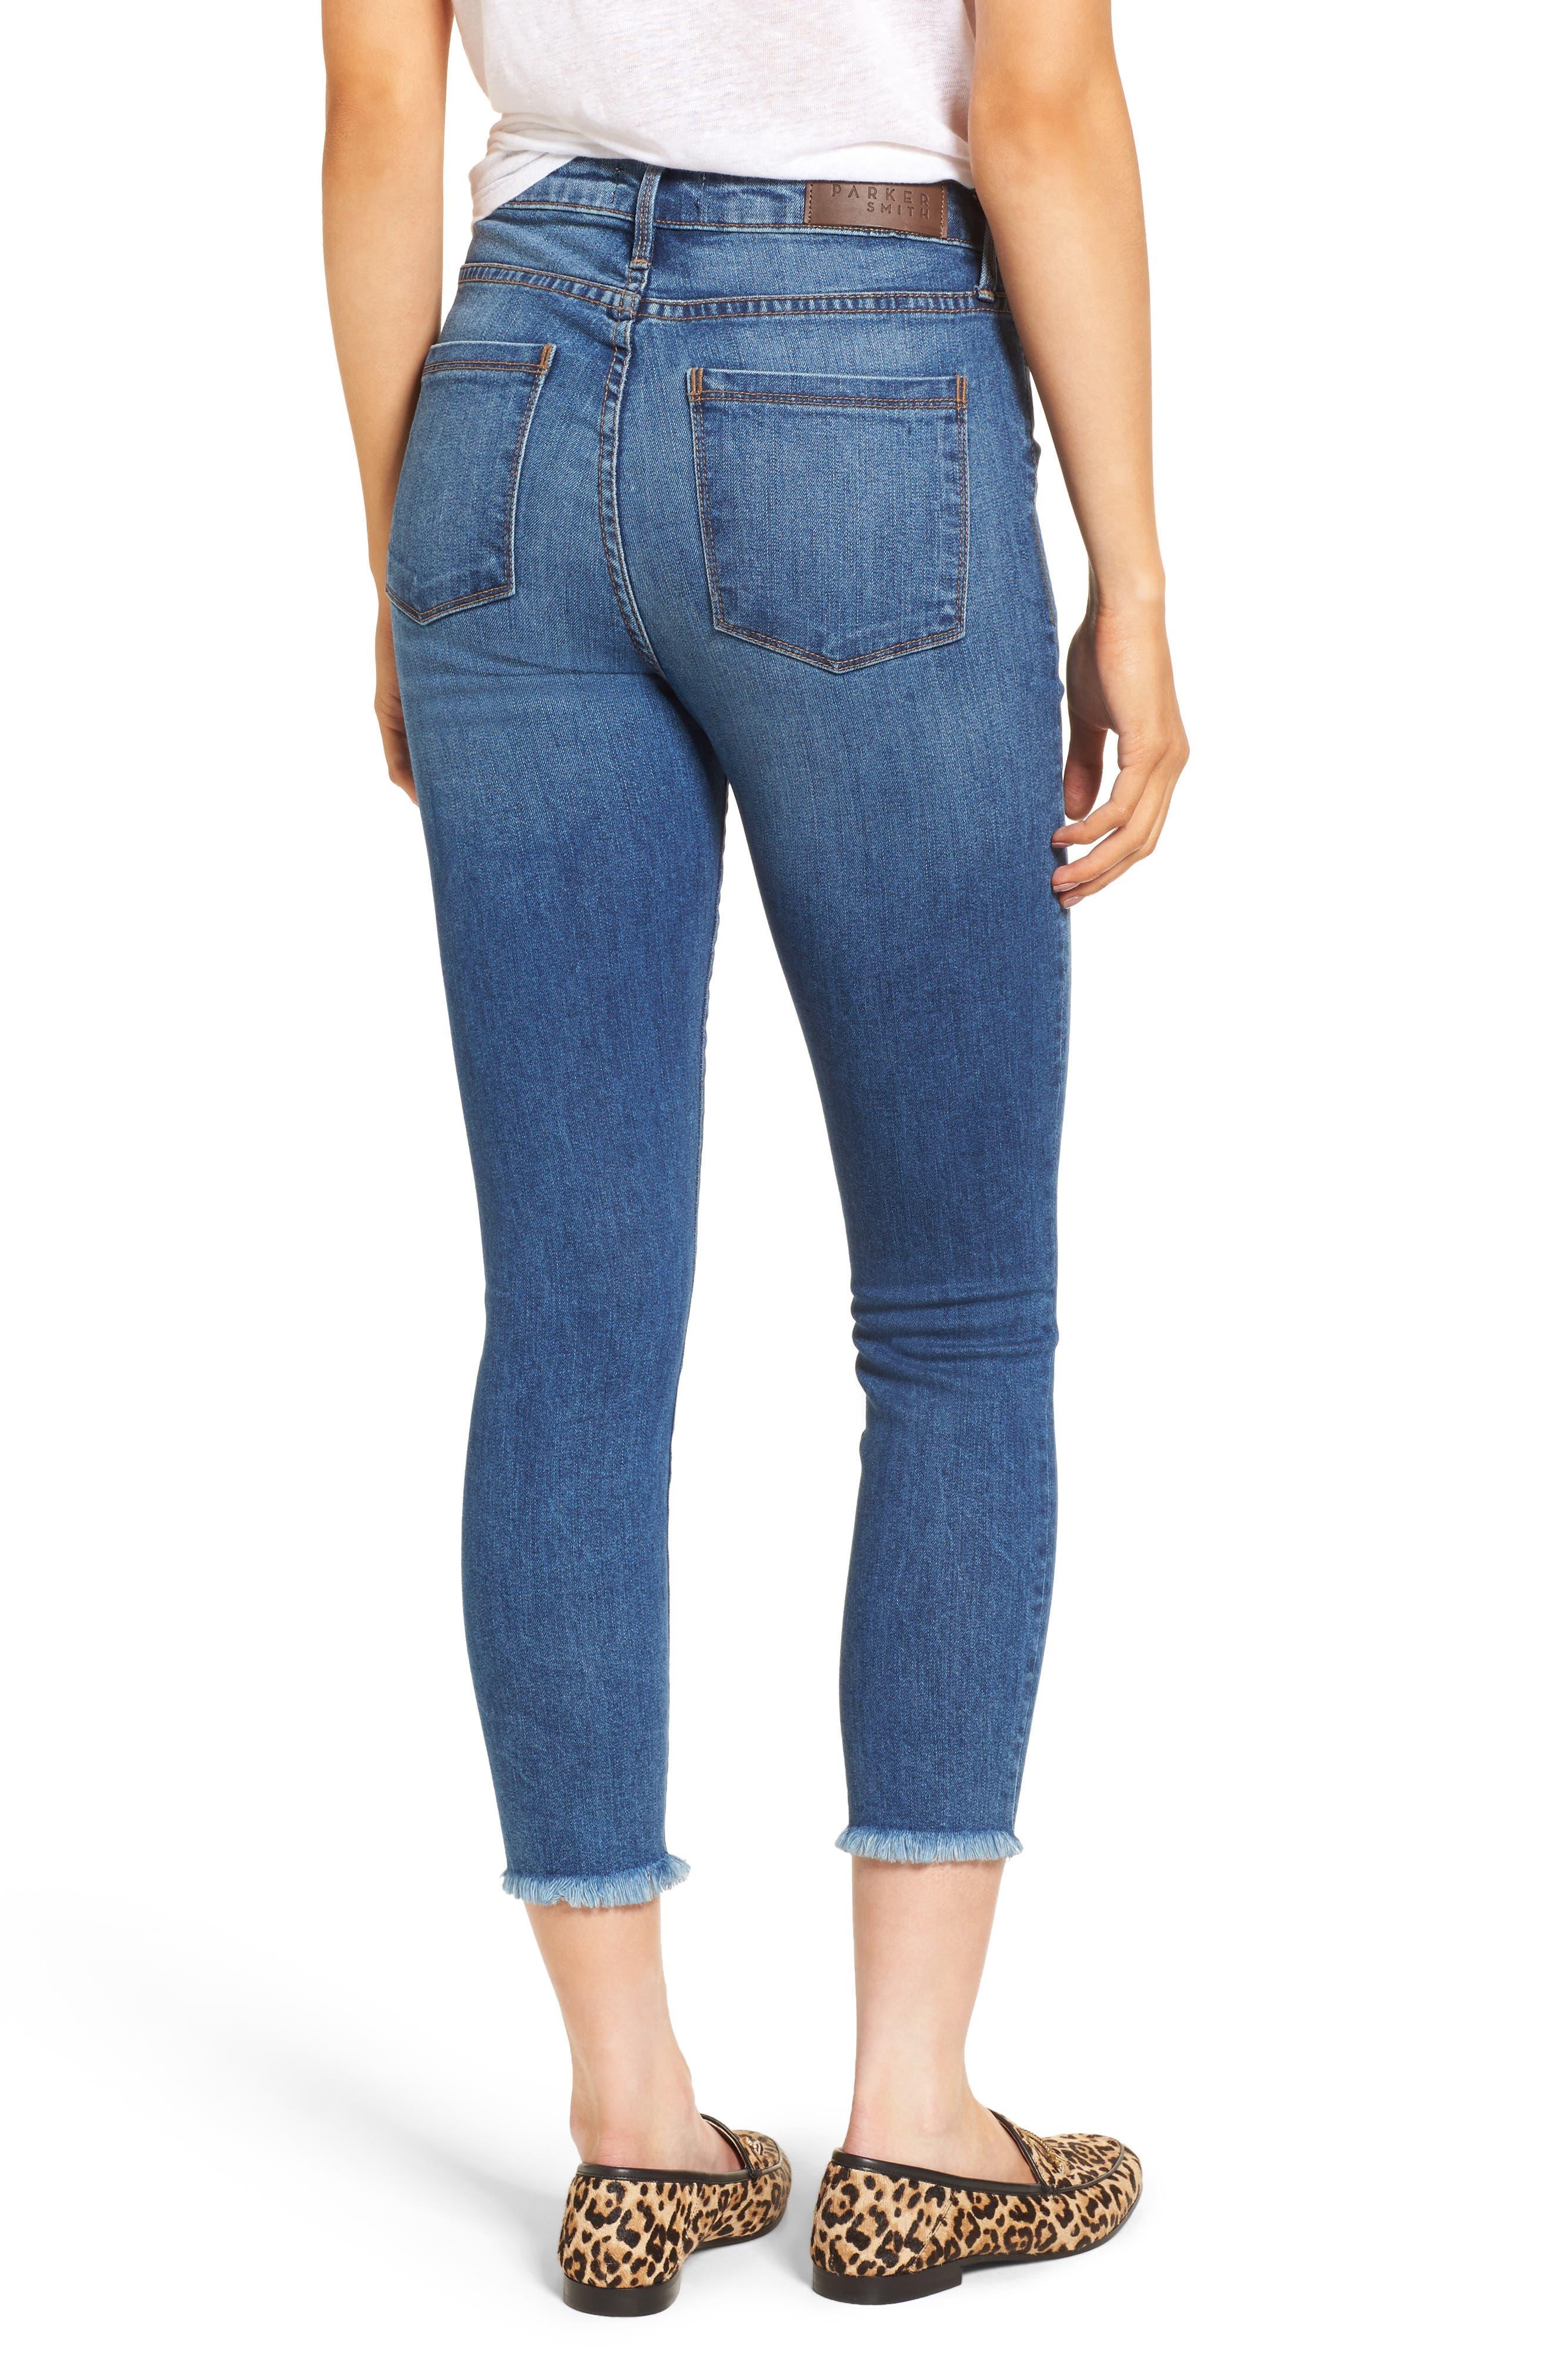 Alternate Image 2  - PARKER SMITH Bombshell Raw Hem Stretch Skinny Jeans (Dawn)